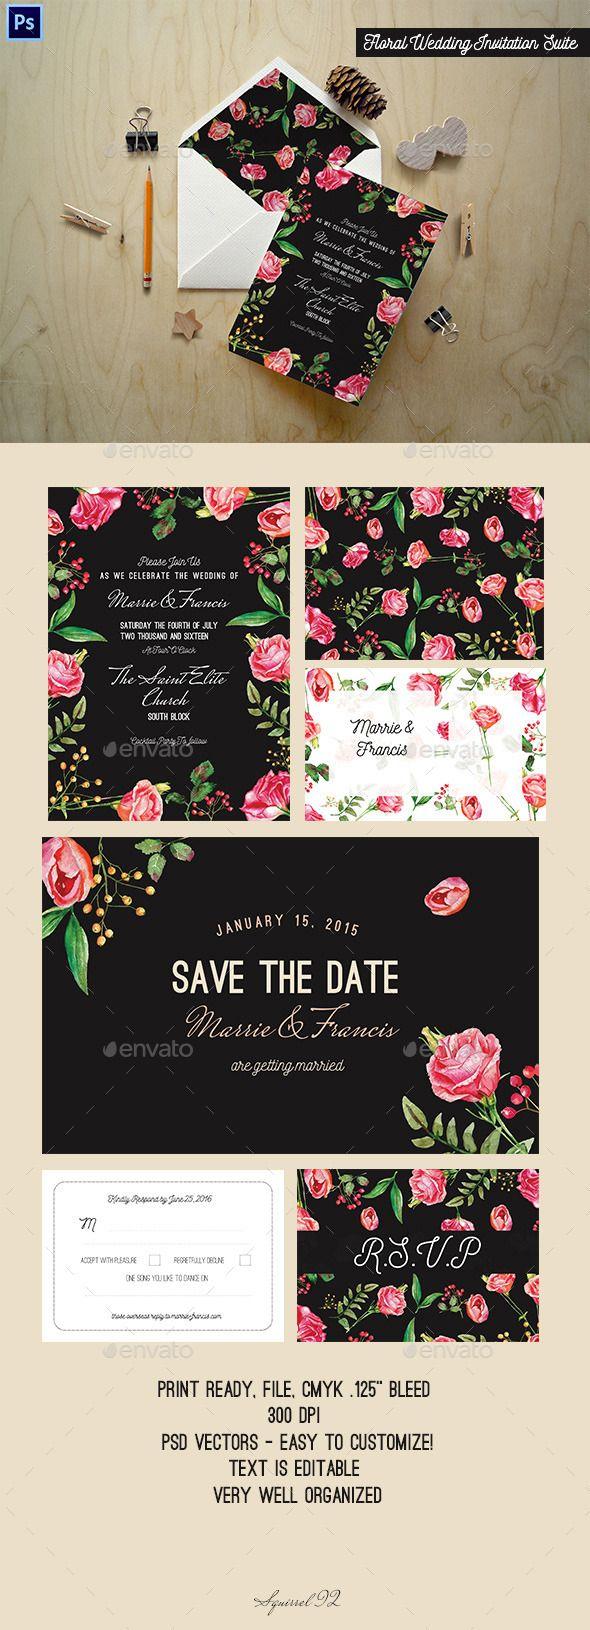 Floral Wedding Invitation Suite Floral Wedding Invitation Suite Floral Wedding Invitations Wedding Invitations